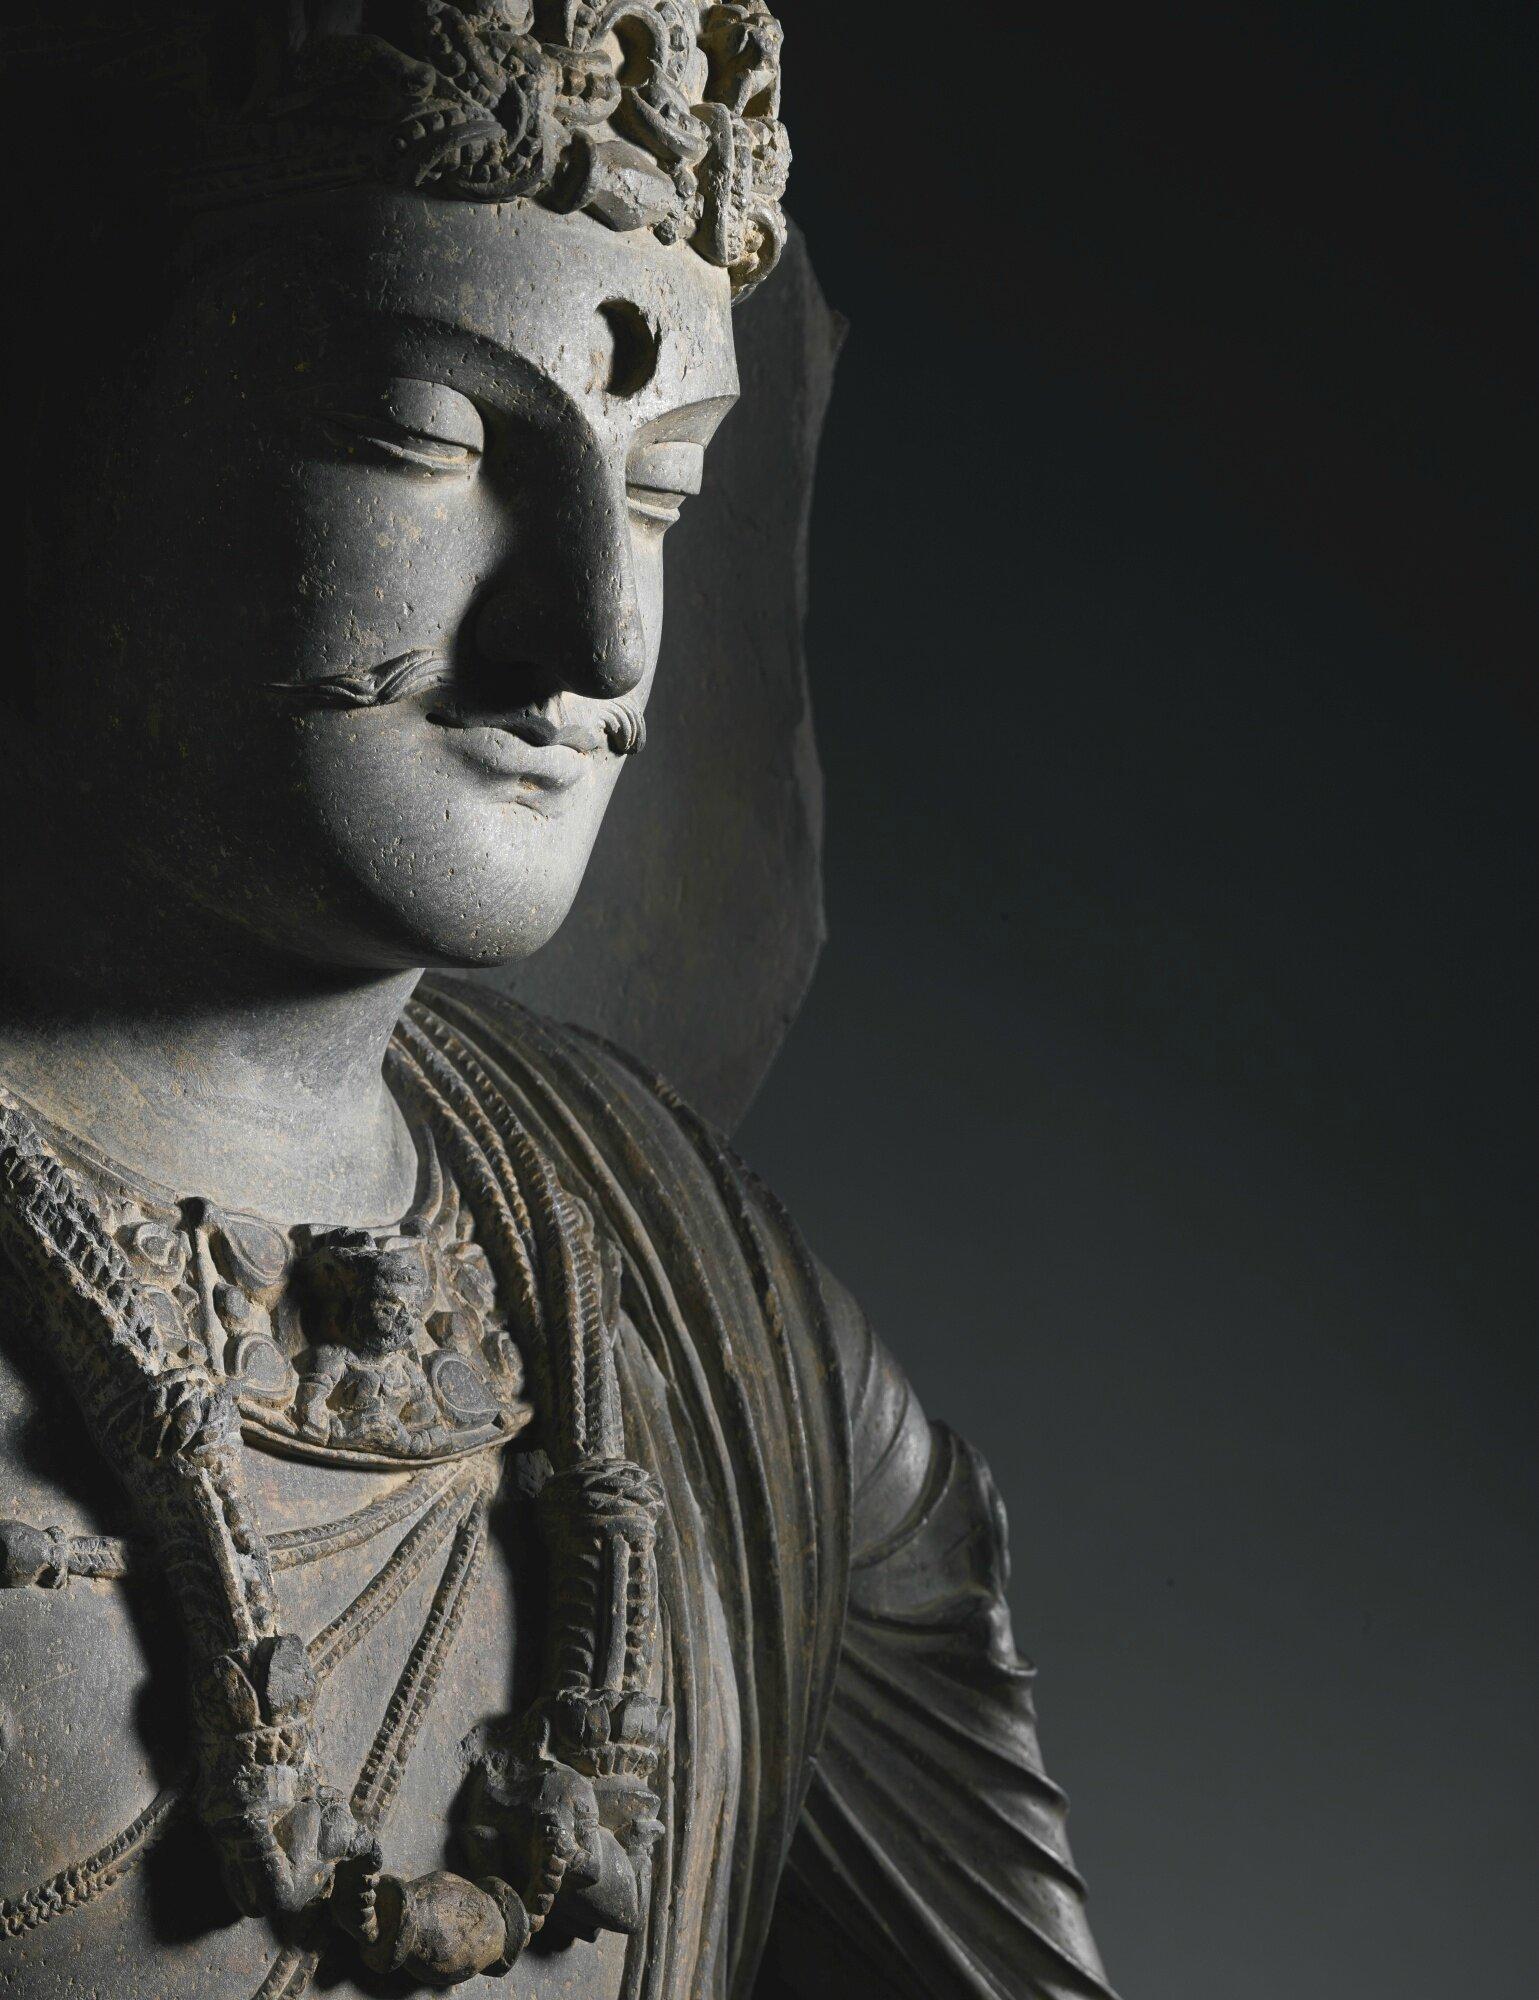 A Grey Schist Standing Bodhisattva Ancient Region Of Gandhara Kushan Period 3rd 4th Century Alain R Truong